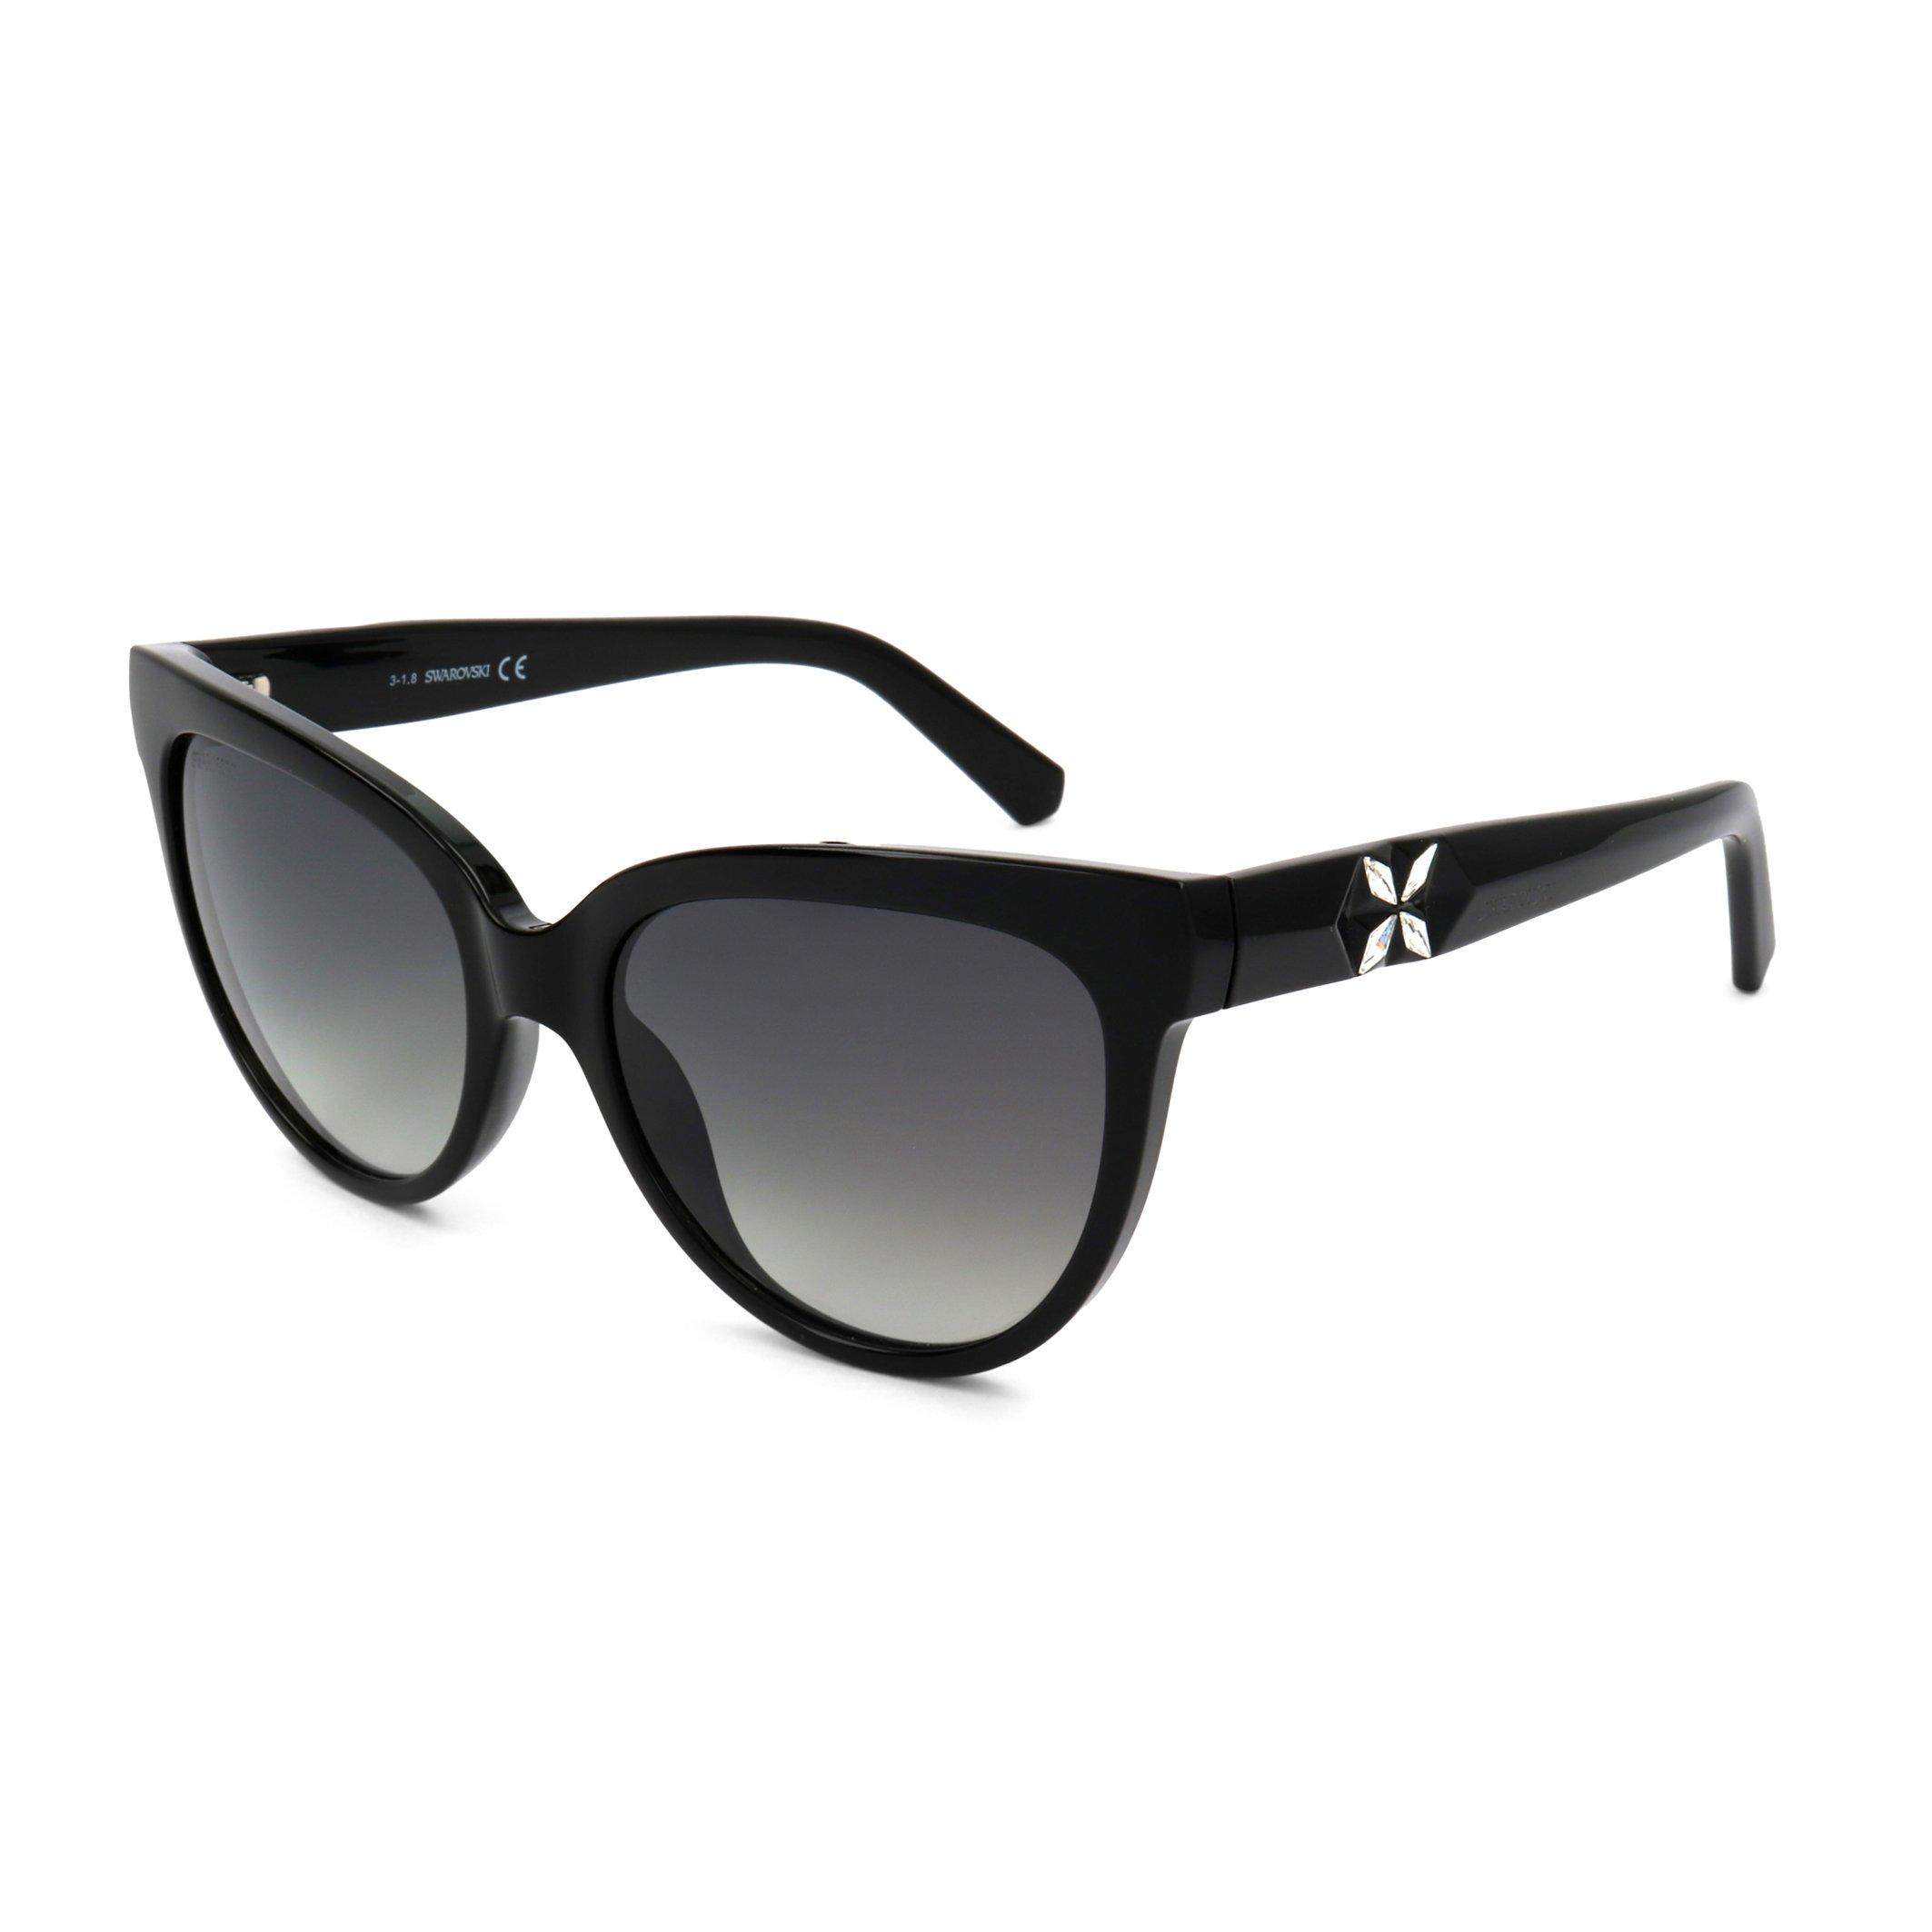 Swarovski Women's Sunglasses Brown SK0187 - black NOSIZE